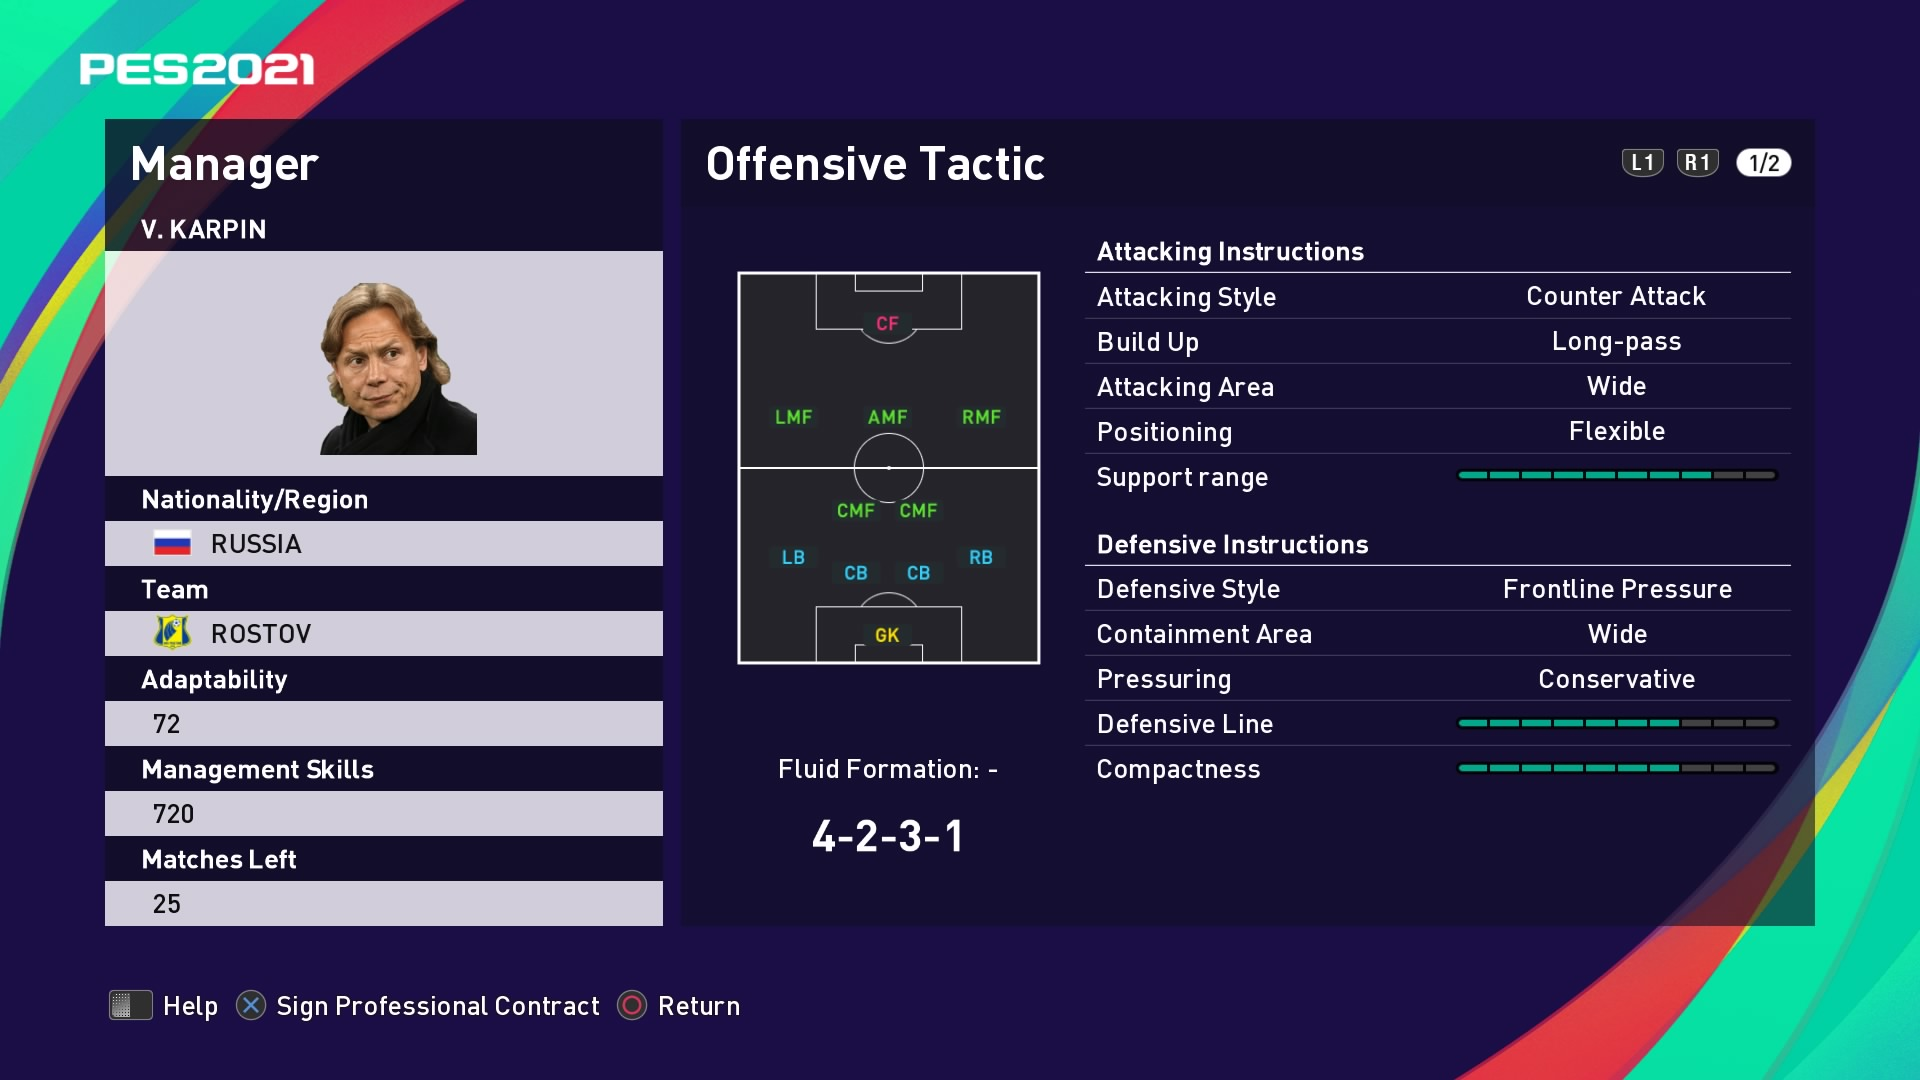 V. Karpin (Valeri Karpin) Offensive Tactic in PES 2021 myClub